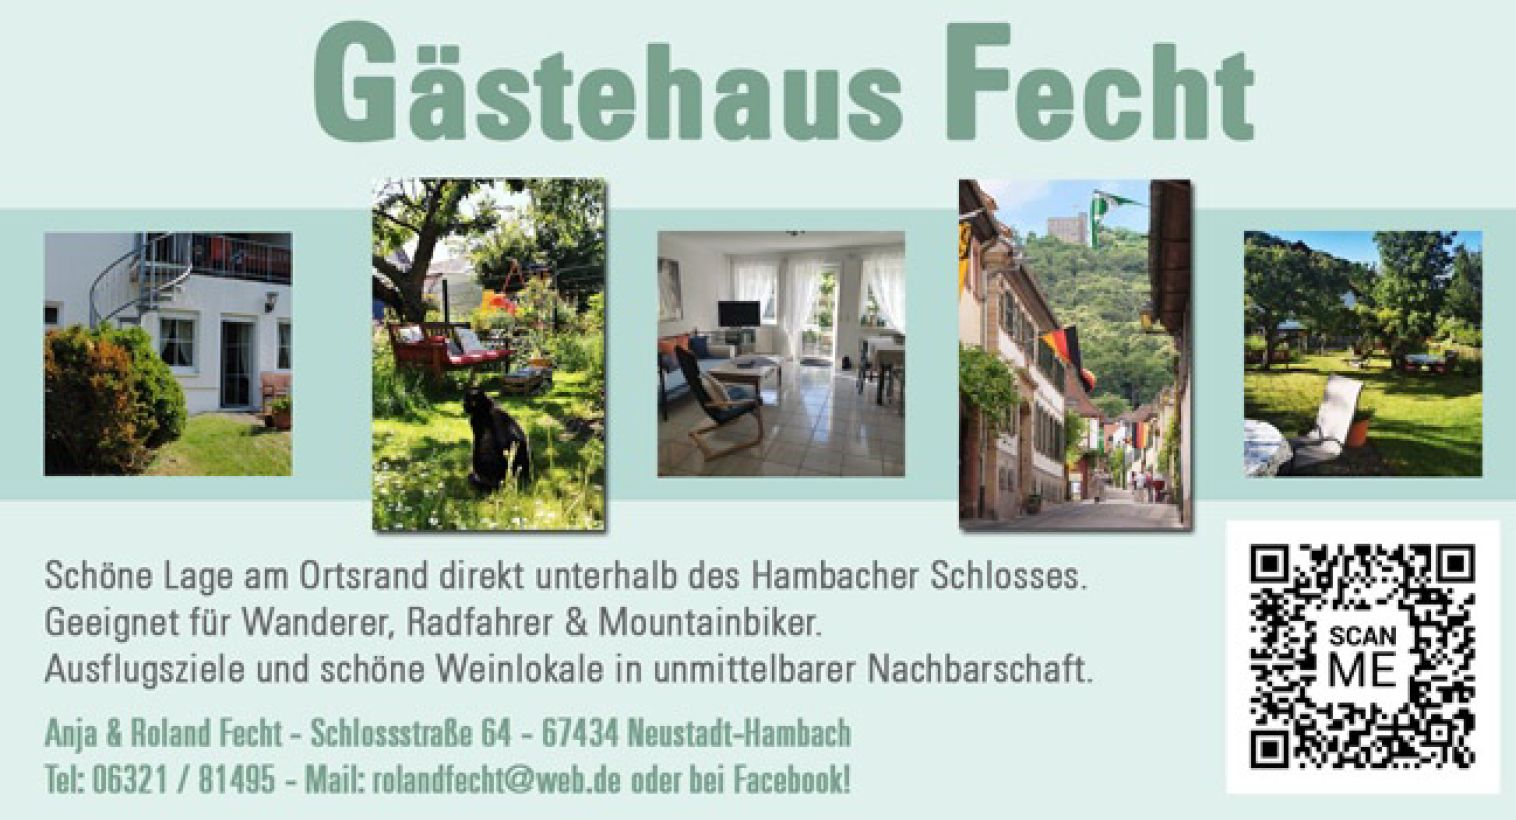 Gästehaus Fecht